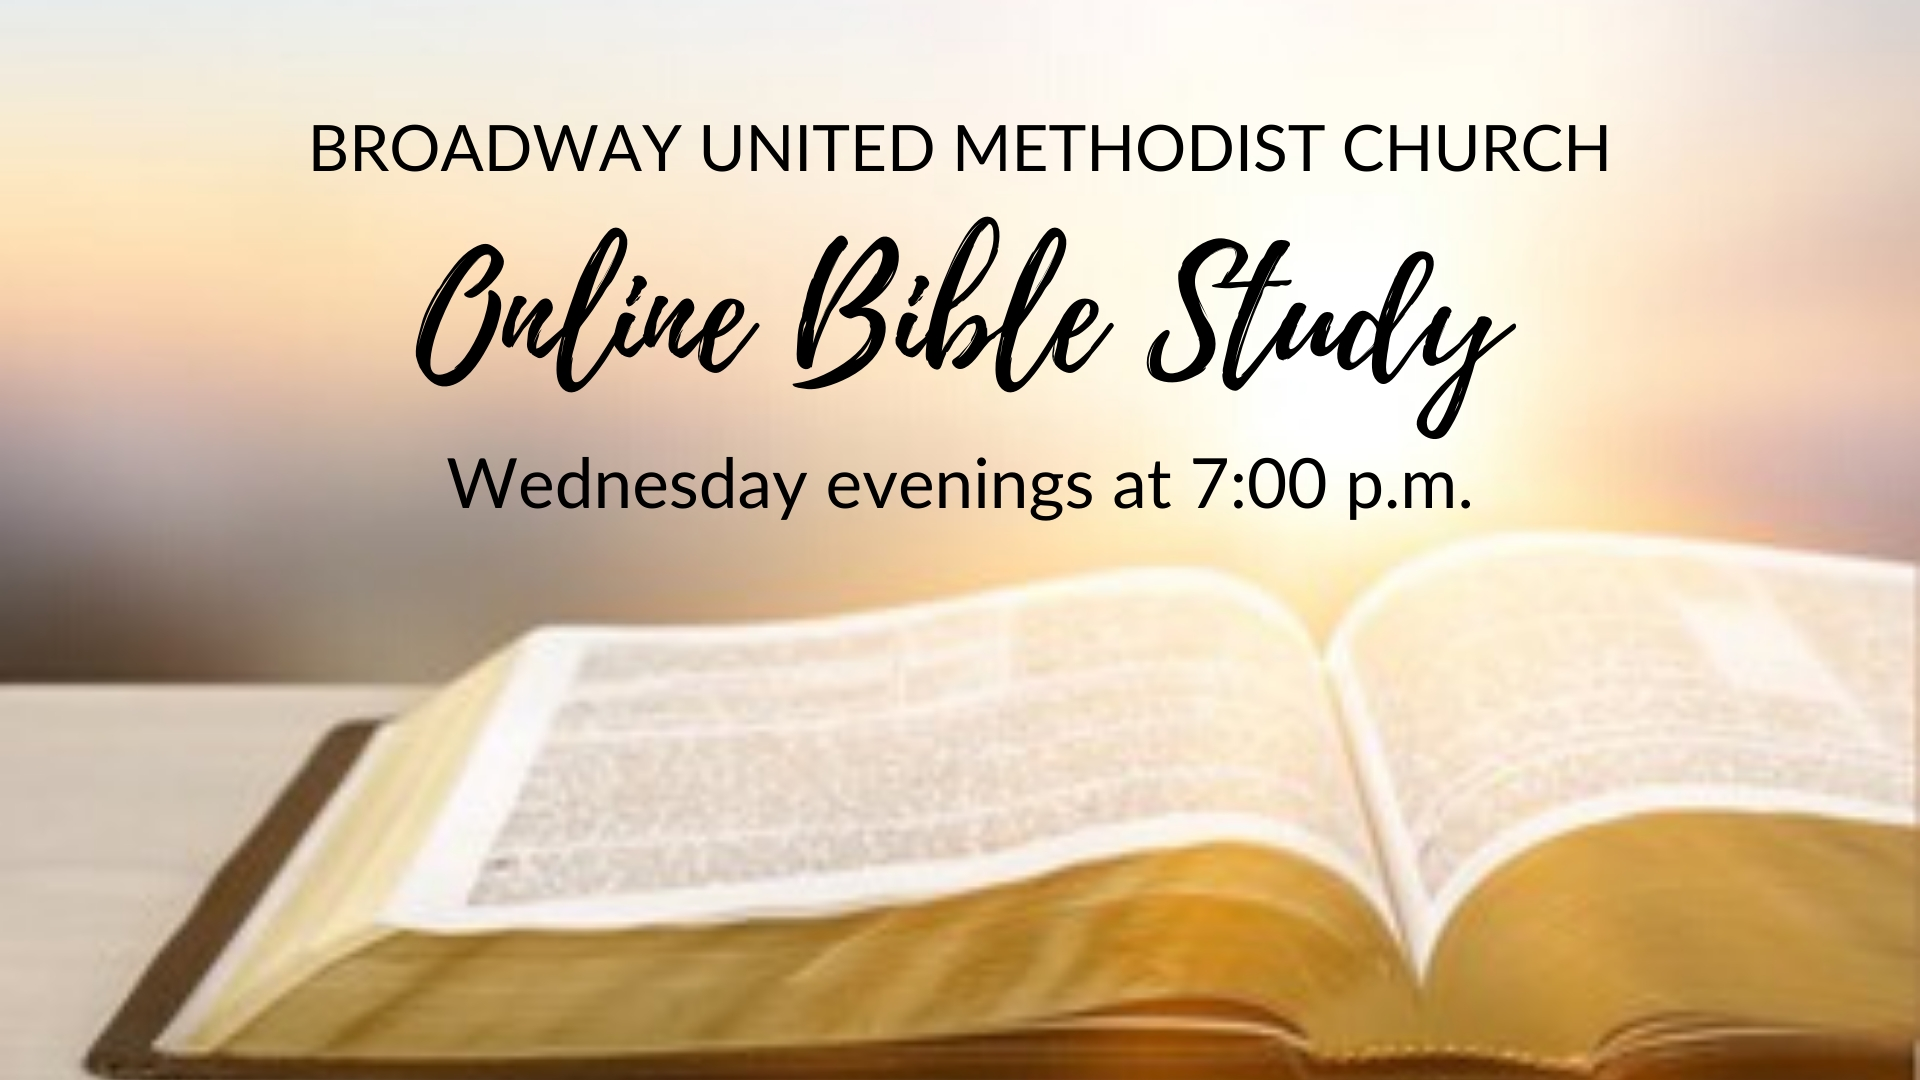 Events | Broadway United Methodist Church  Lectionary Readings United Methodist 2020